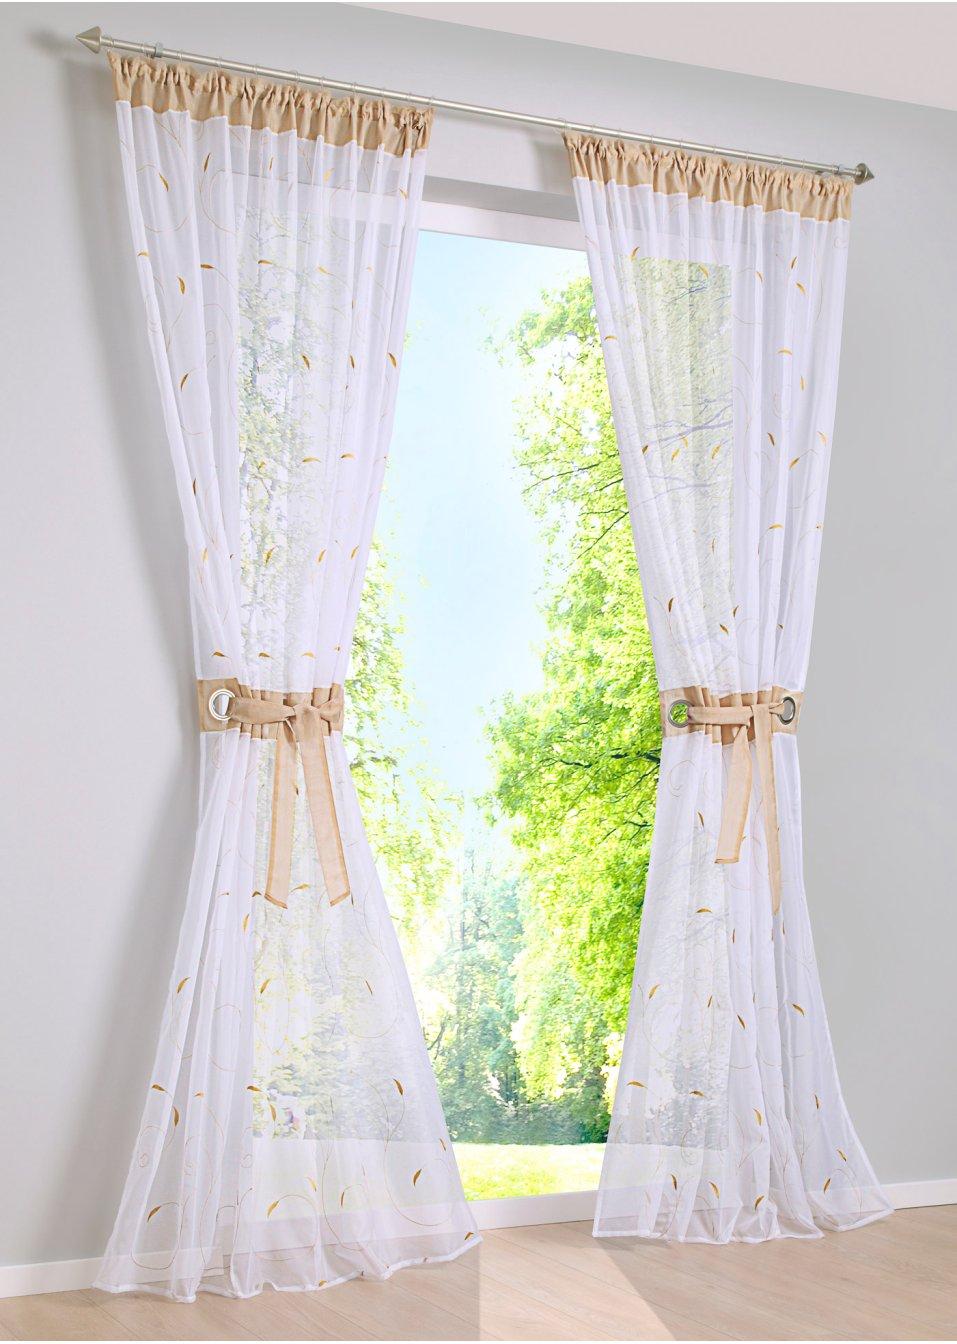 voilage jana 1 pce galon fronceur sable bpc living acheter online. Black Bedroom Furniture Sets. Home Design Ideas